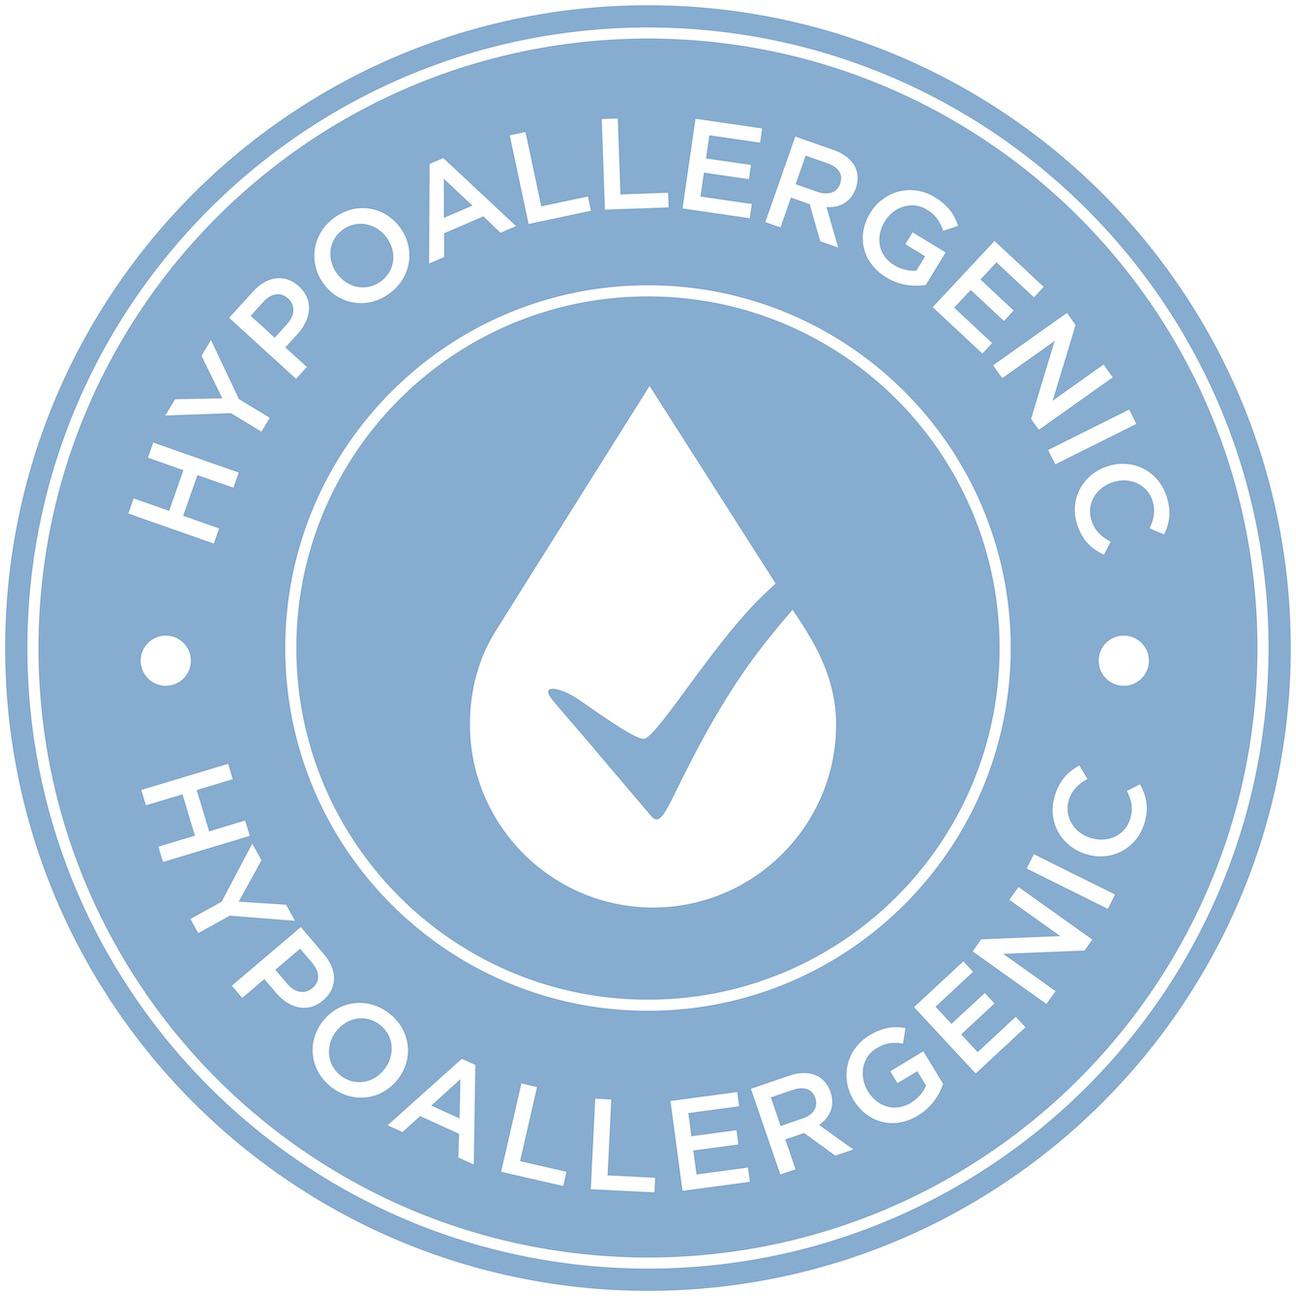 Blue hypoallergenic certificate symbol